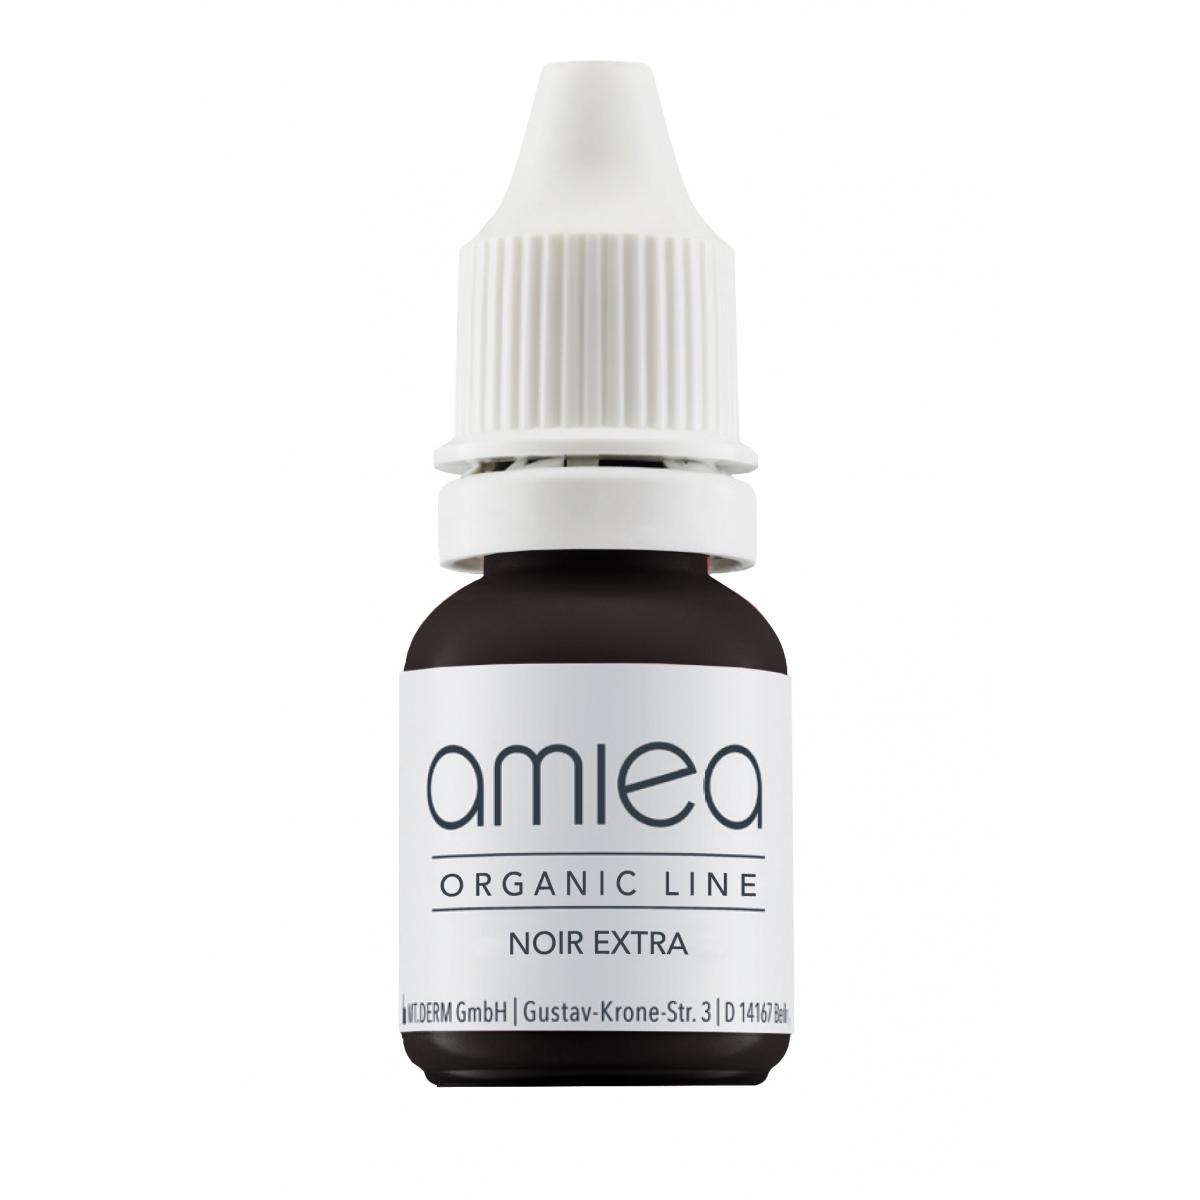 Organicline (5 ml)  - PIGMENTS AMIEA ORGANICLINE NOIR EXTRA, Flacon 5 ml